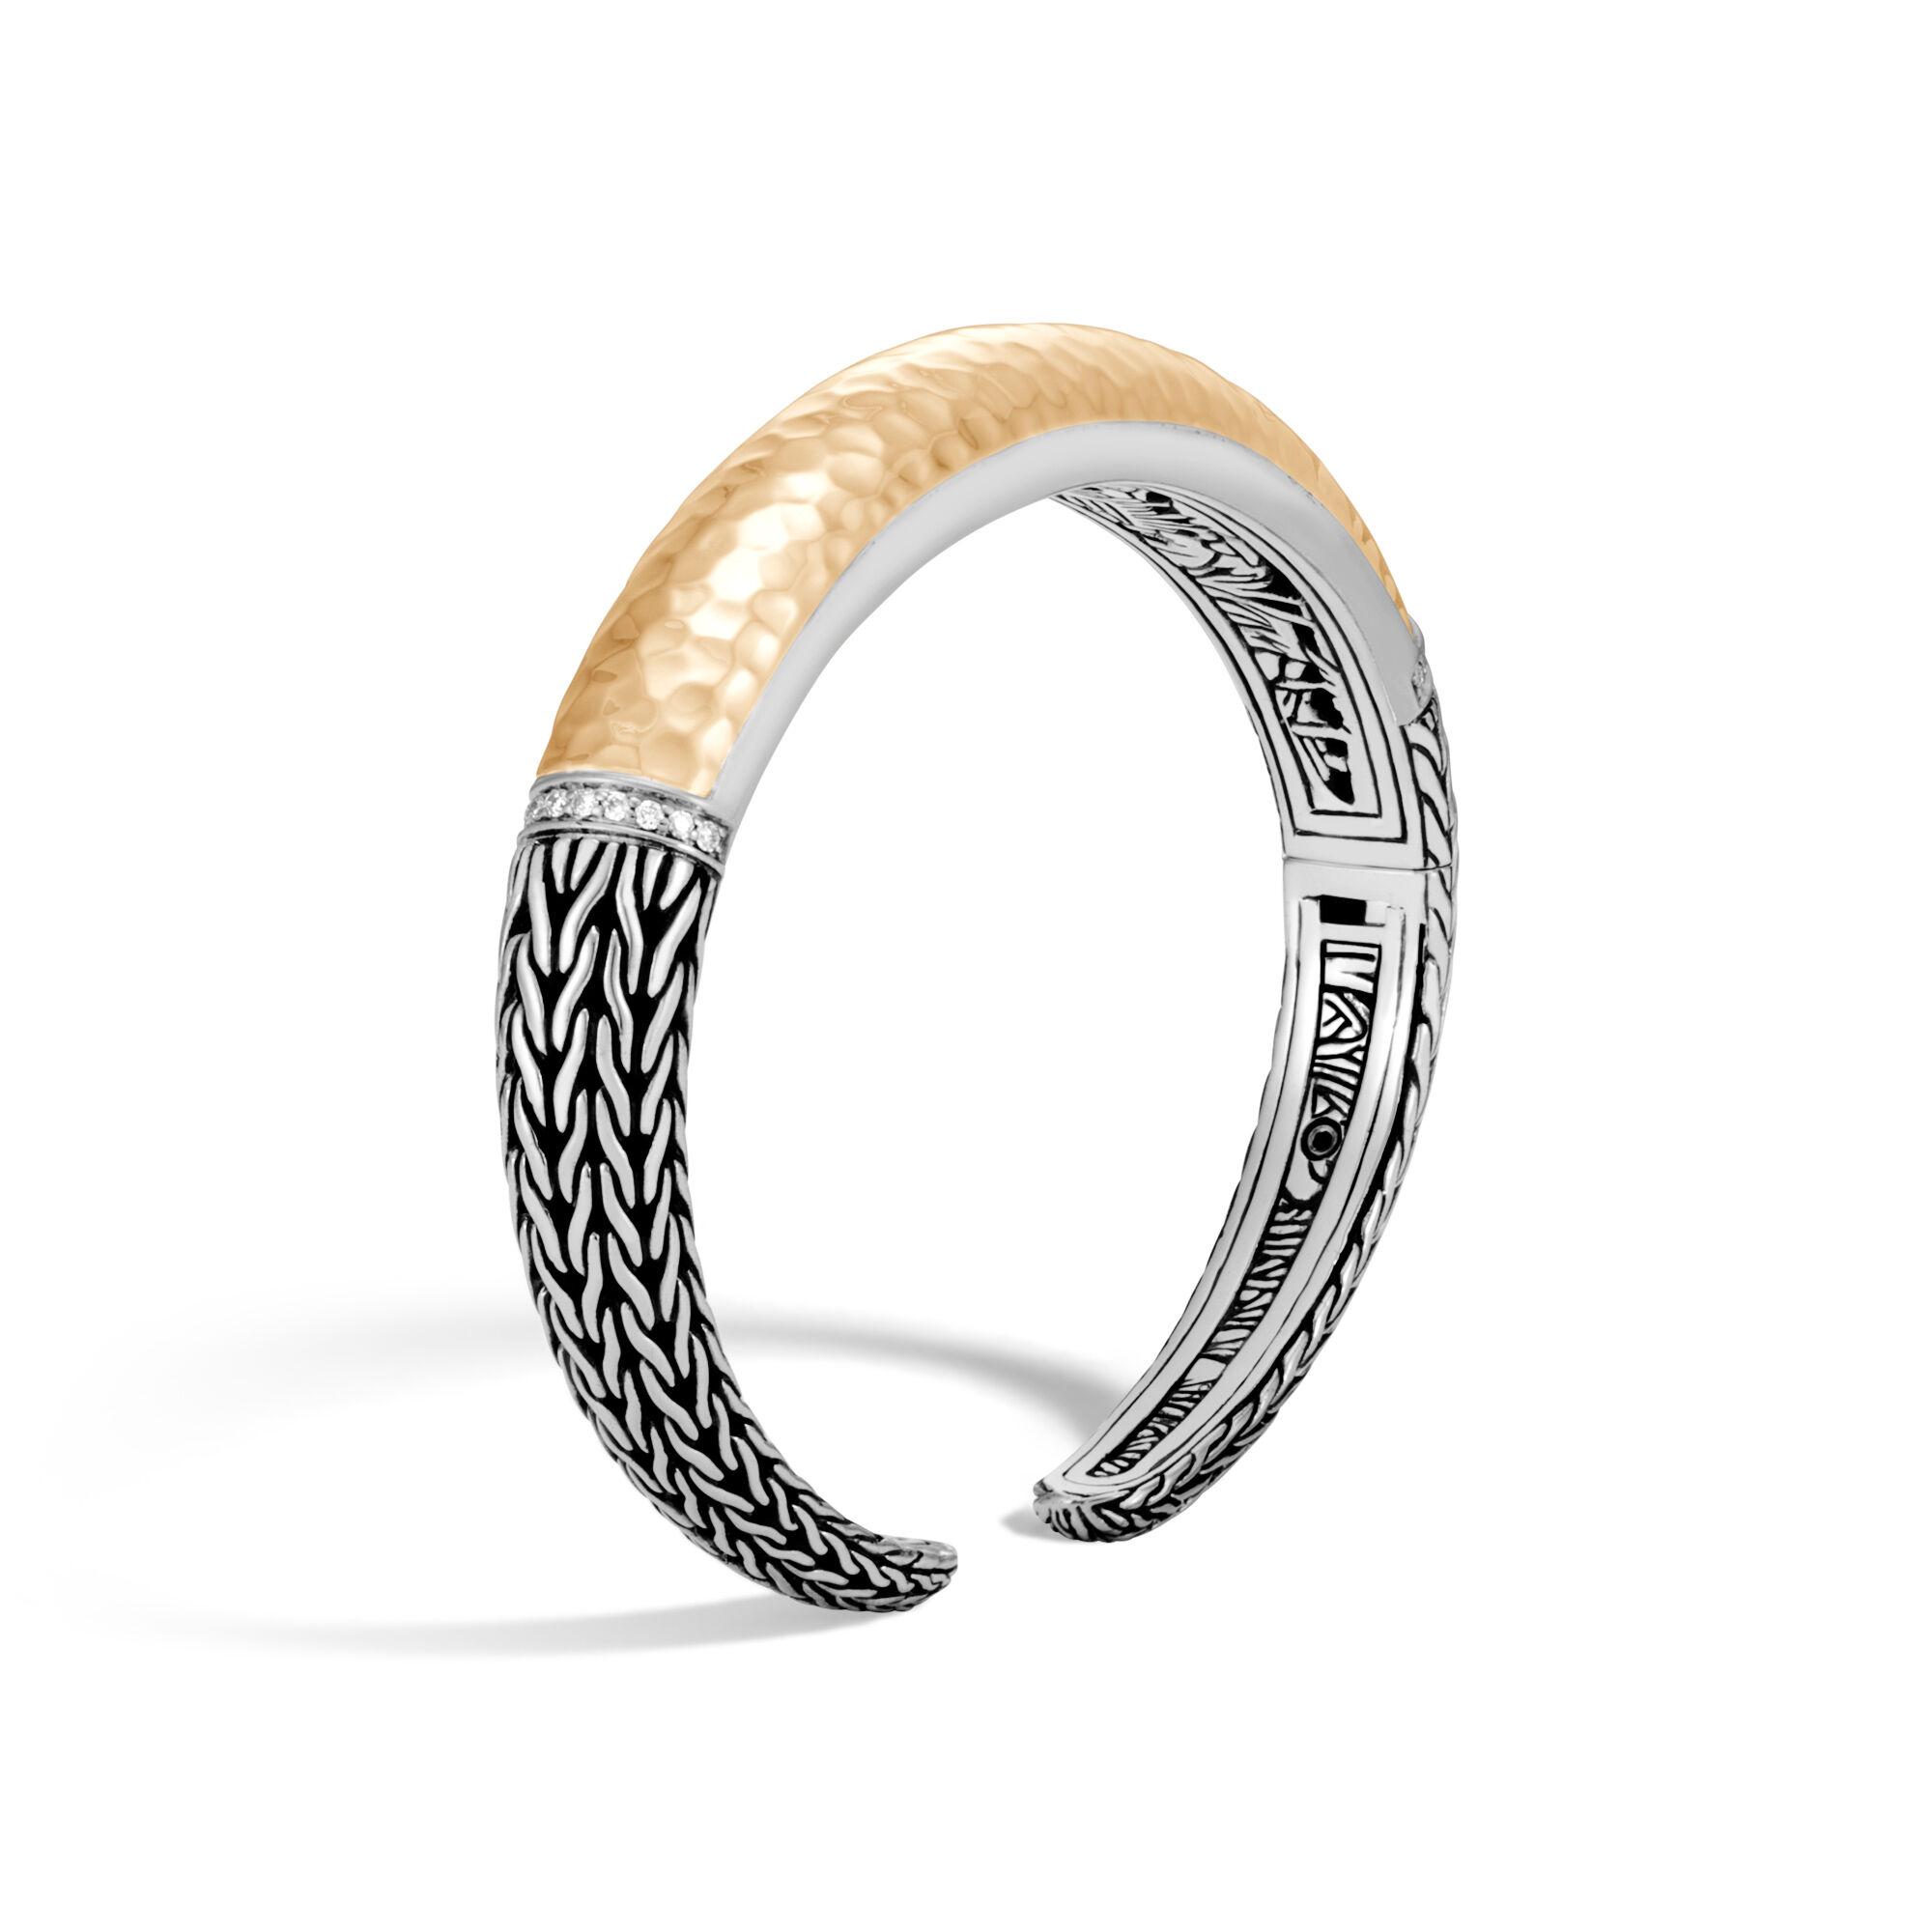 John Hardy Modern Chain 18K Gold & Silver Large Kick Cuff Bracelet Hl8r9JD